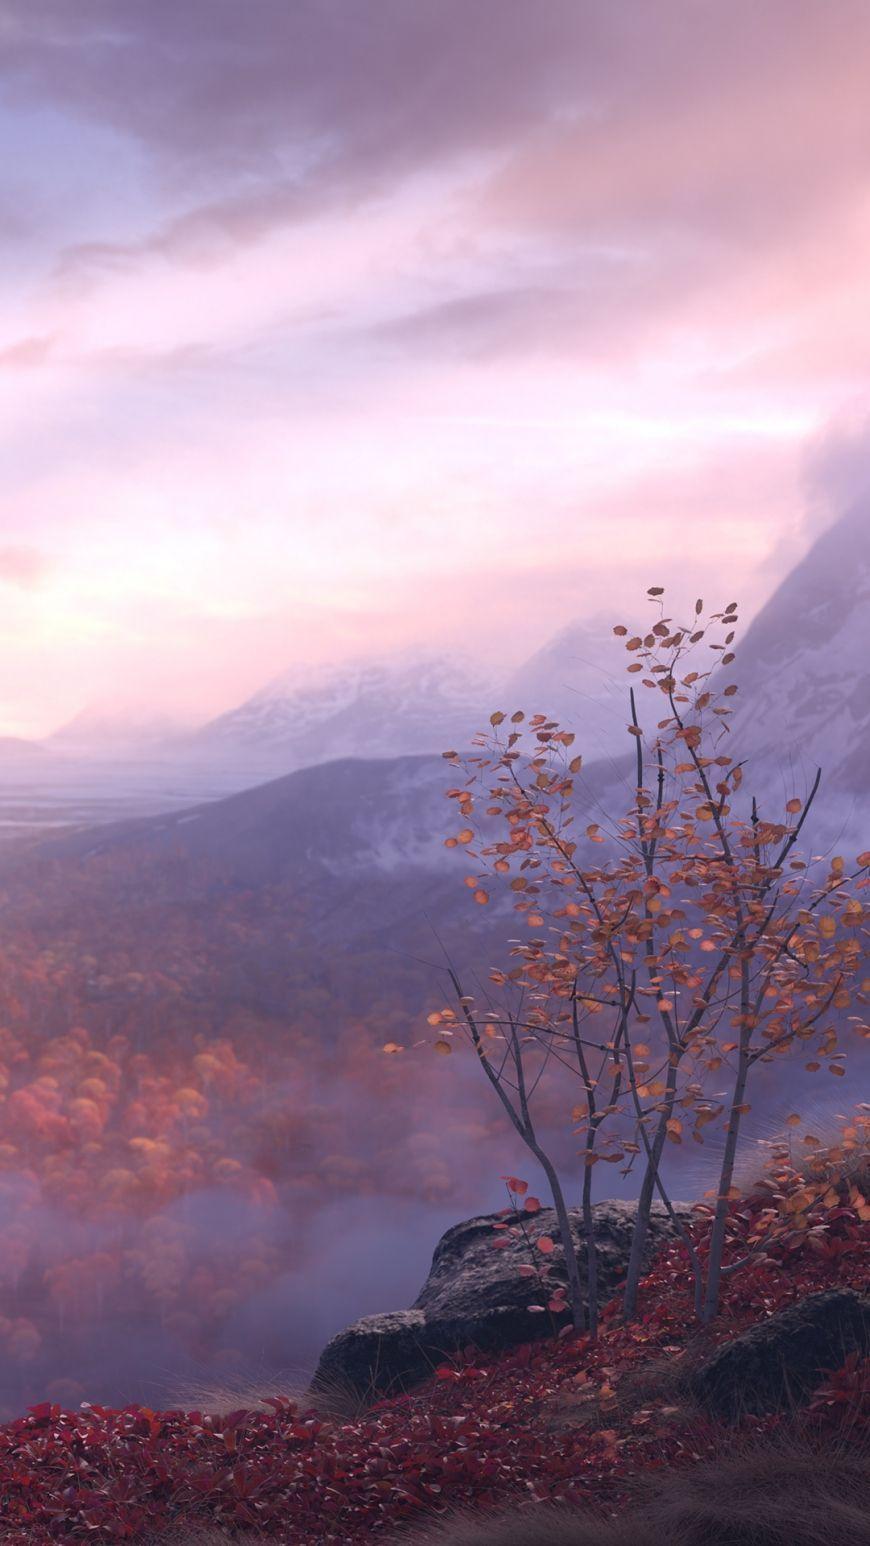 Disney Gefrorenes 2 Handy Hintergrundbilder In 2020 Frozen Background Frozen Wallpaper Disney Princess Wallpaper